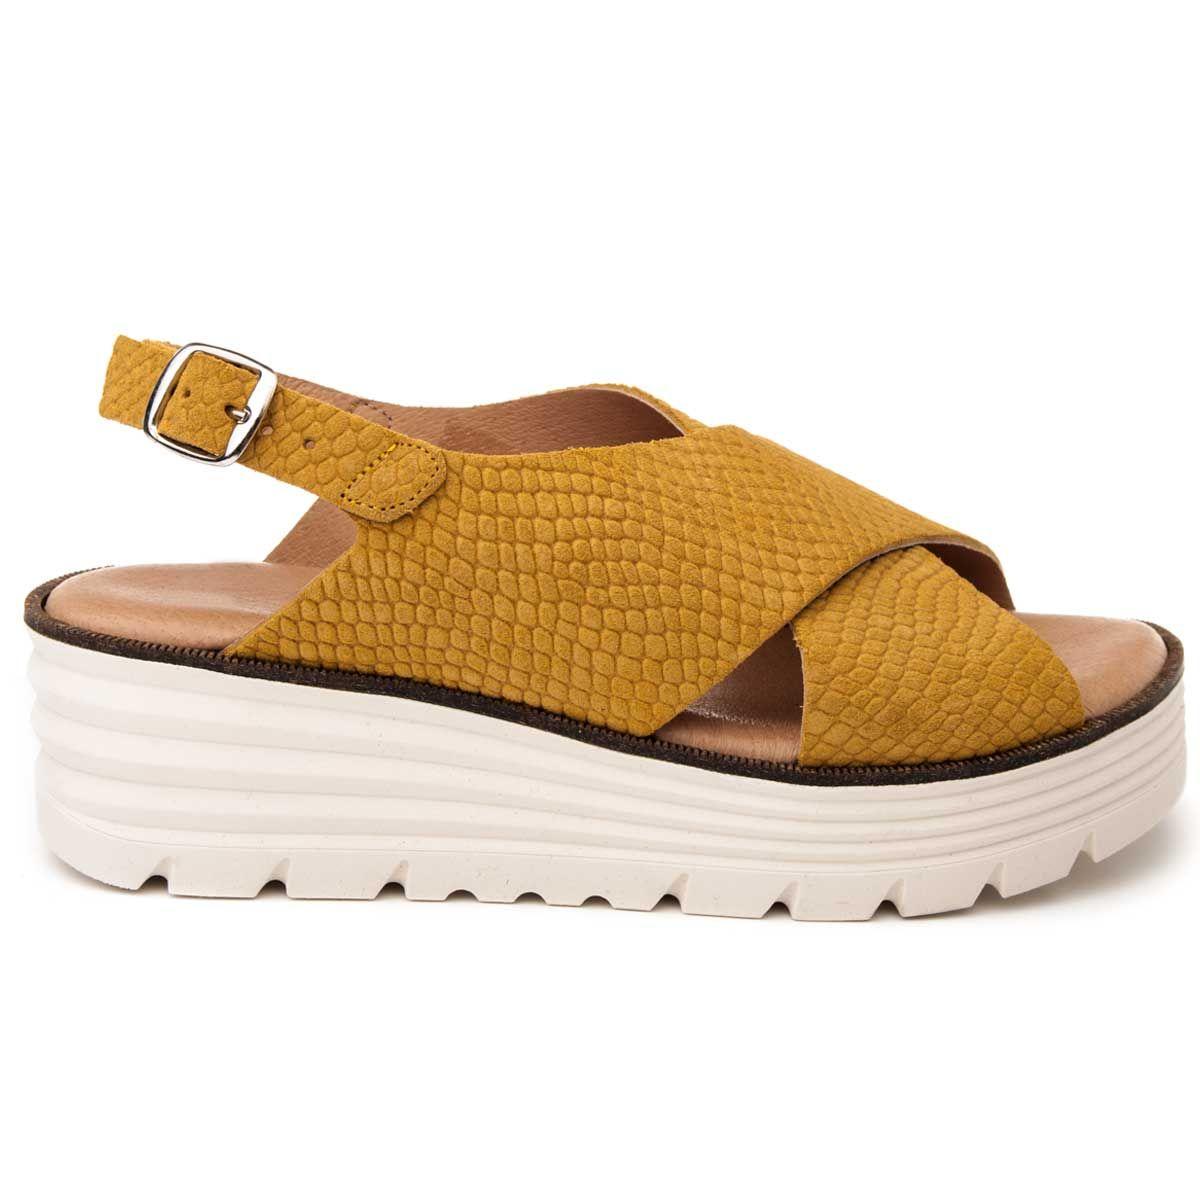 Purapiel Wedge Sandal in Mustard